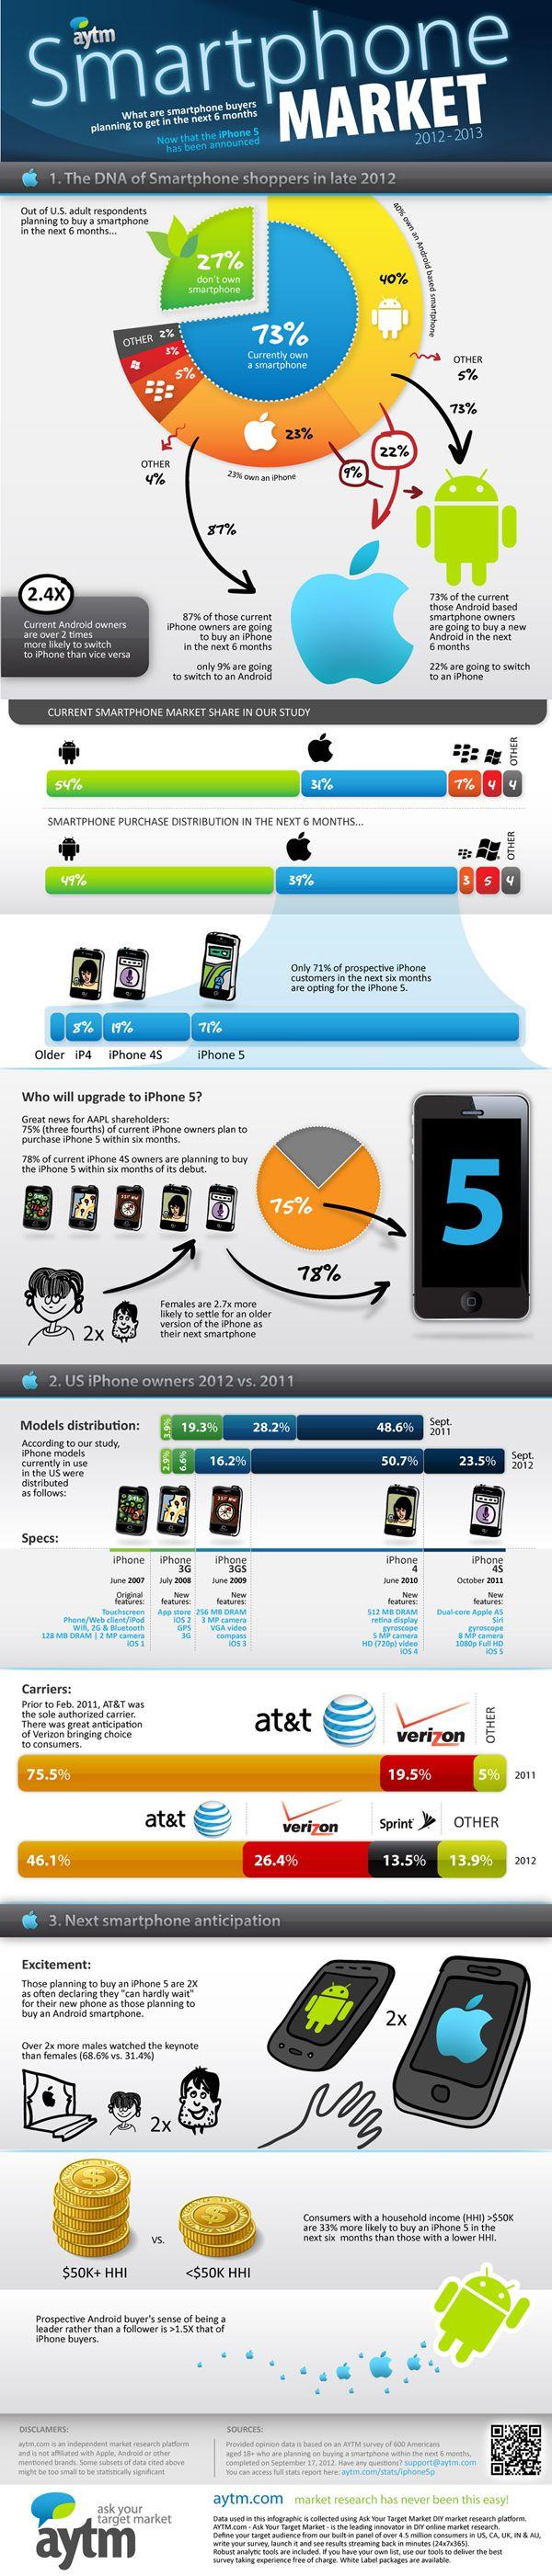 Smartphone Market- Apple- Android - Windows ..